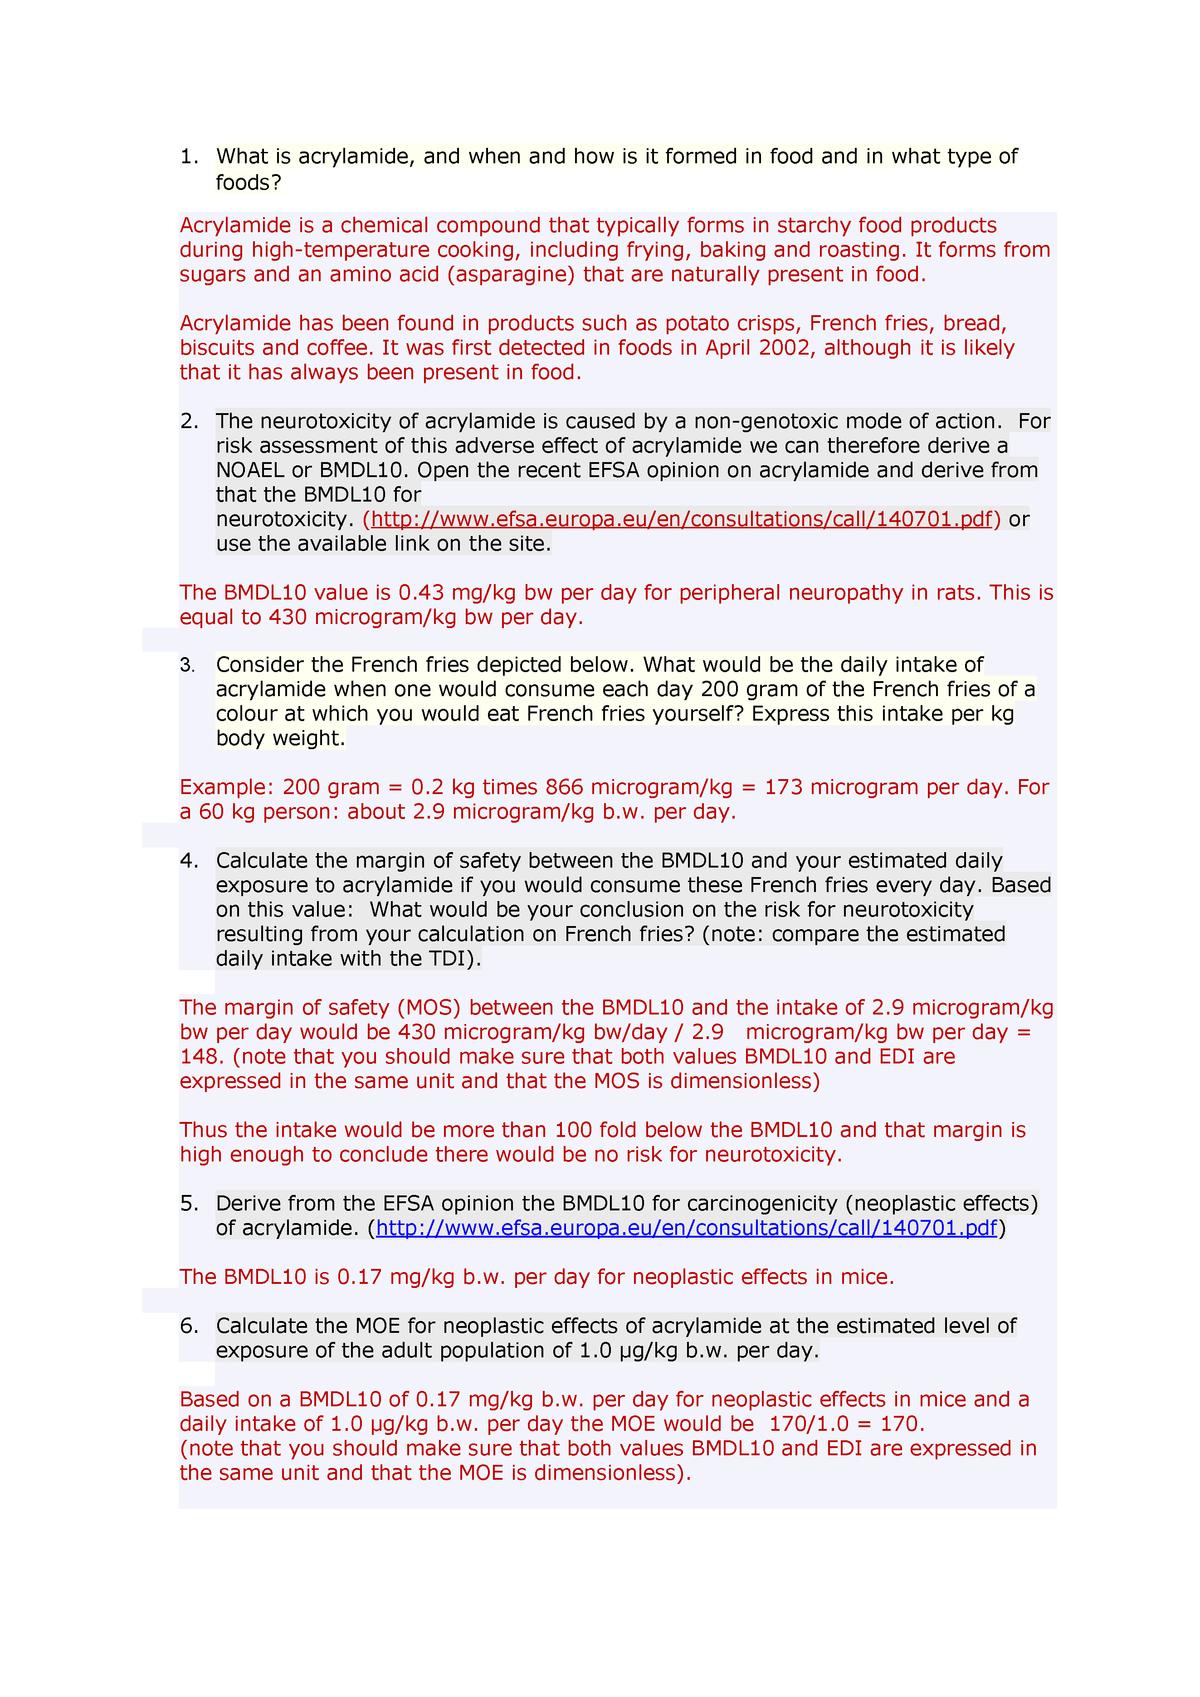 Verplichte opgaven - Risk assessment opdracht - acrylamide - TOX